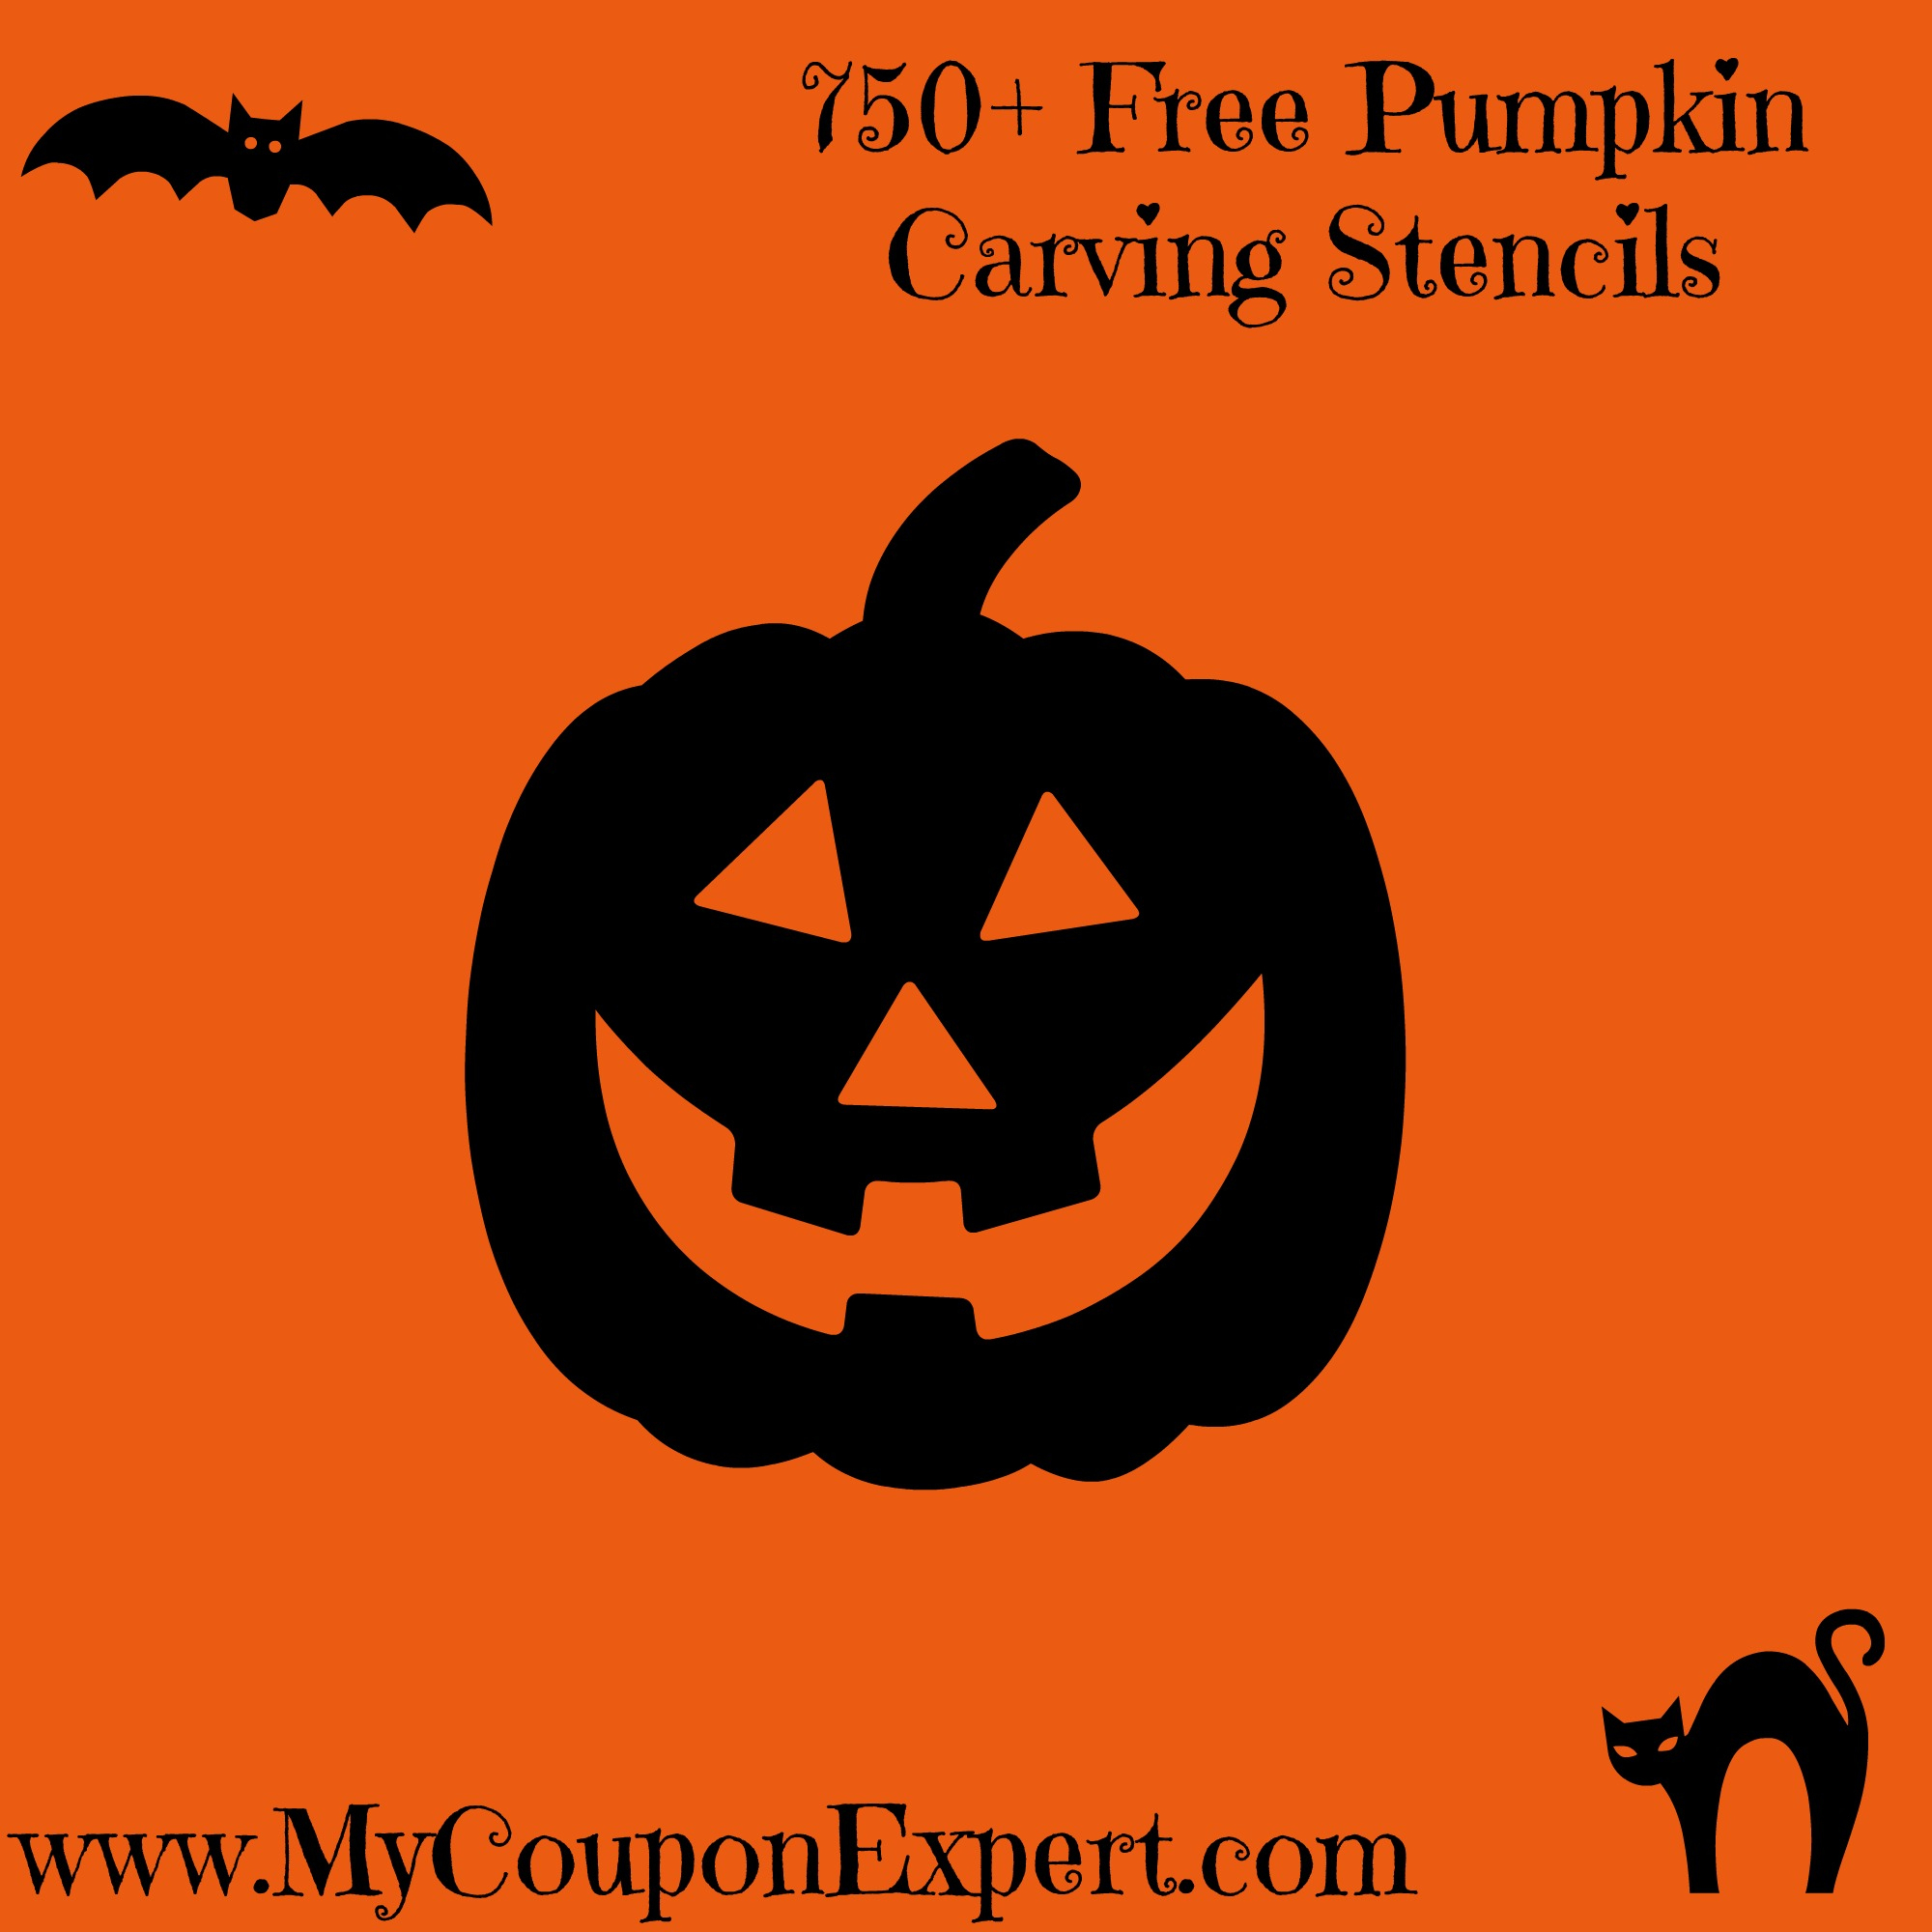 750+ Free Pumpkin Carving Stencils · - Free Pumpkin Carving Templates Printable